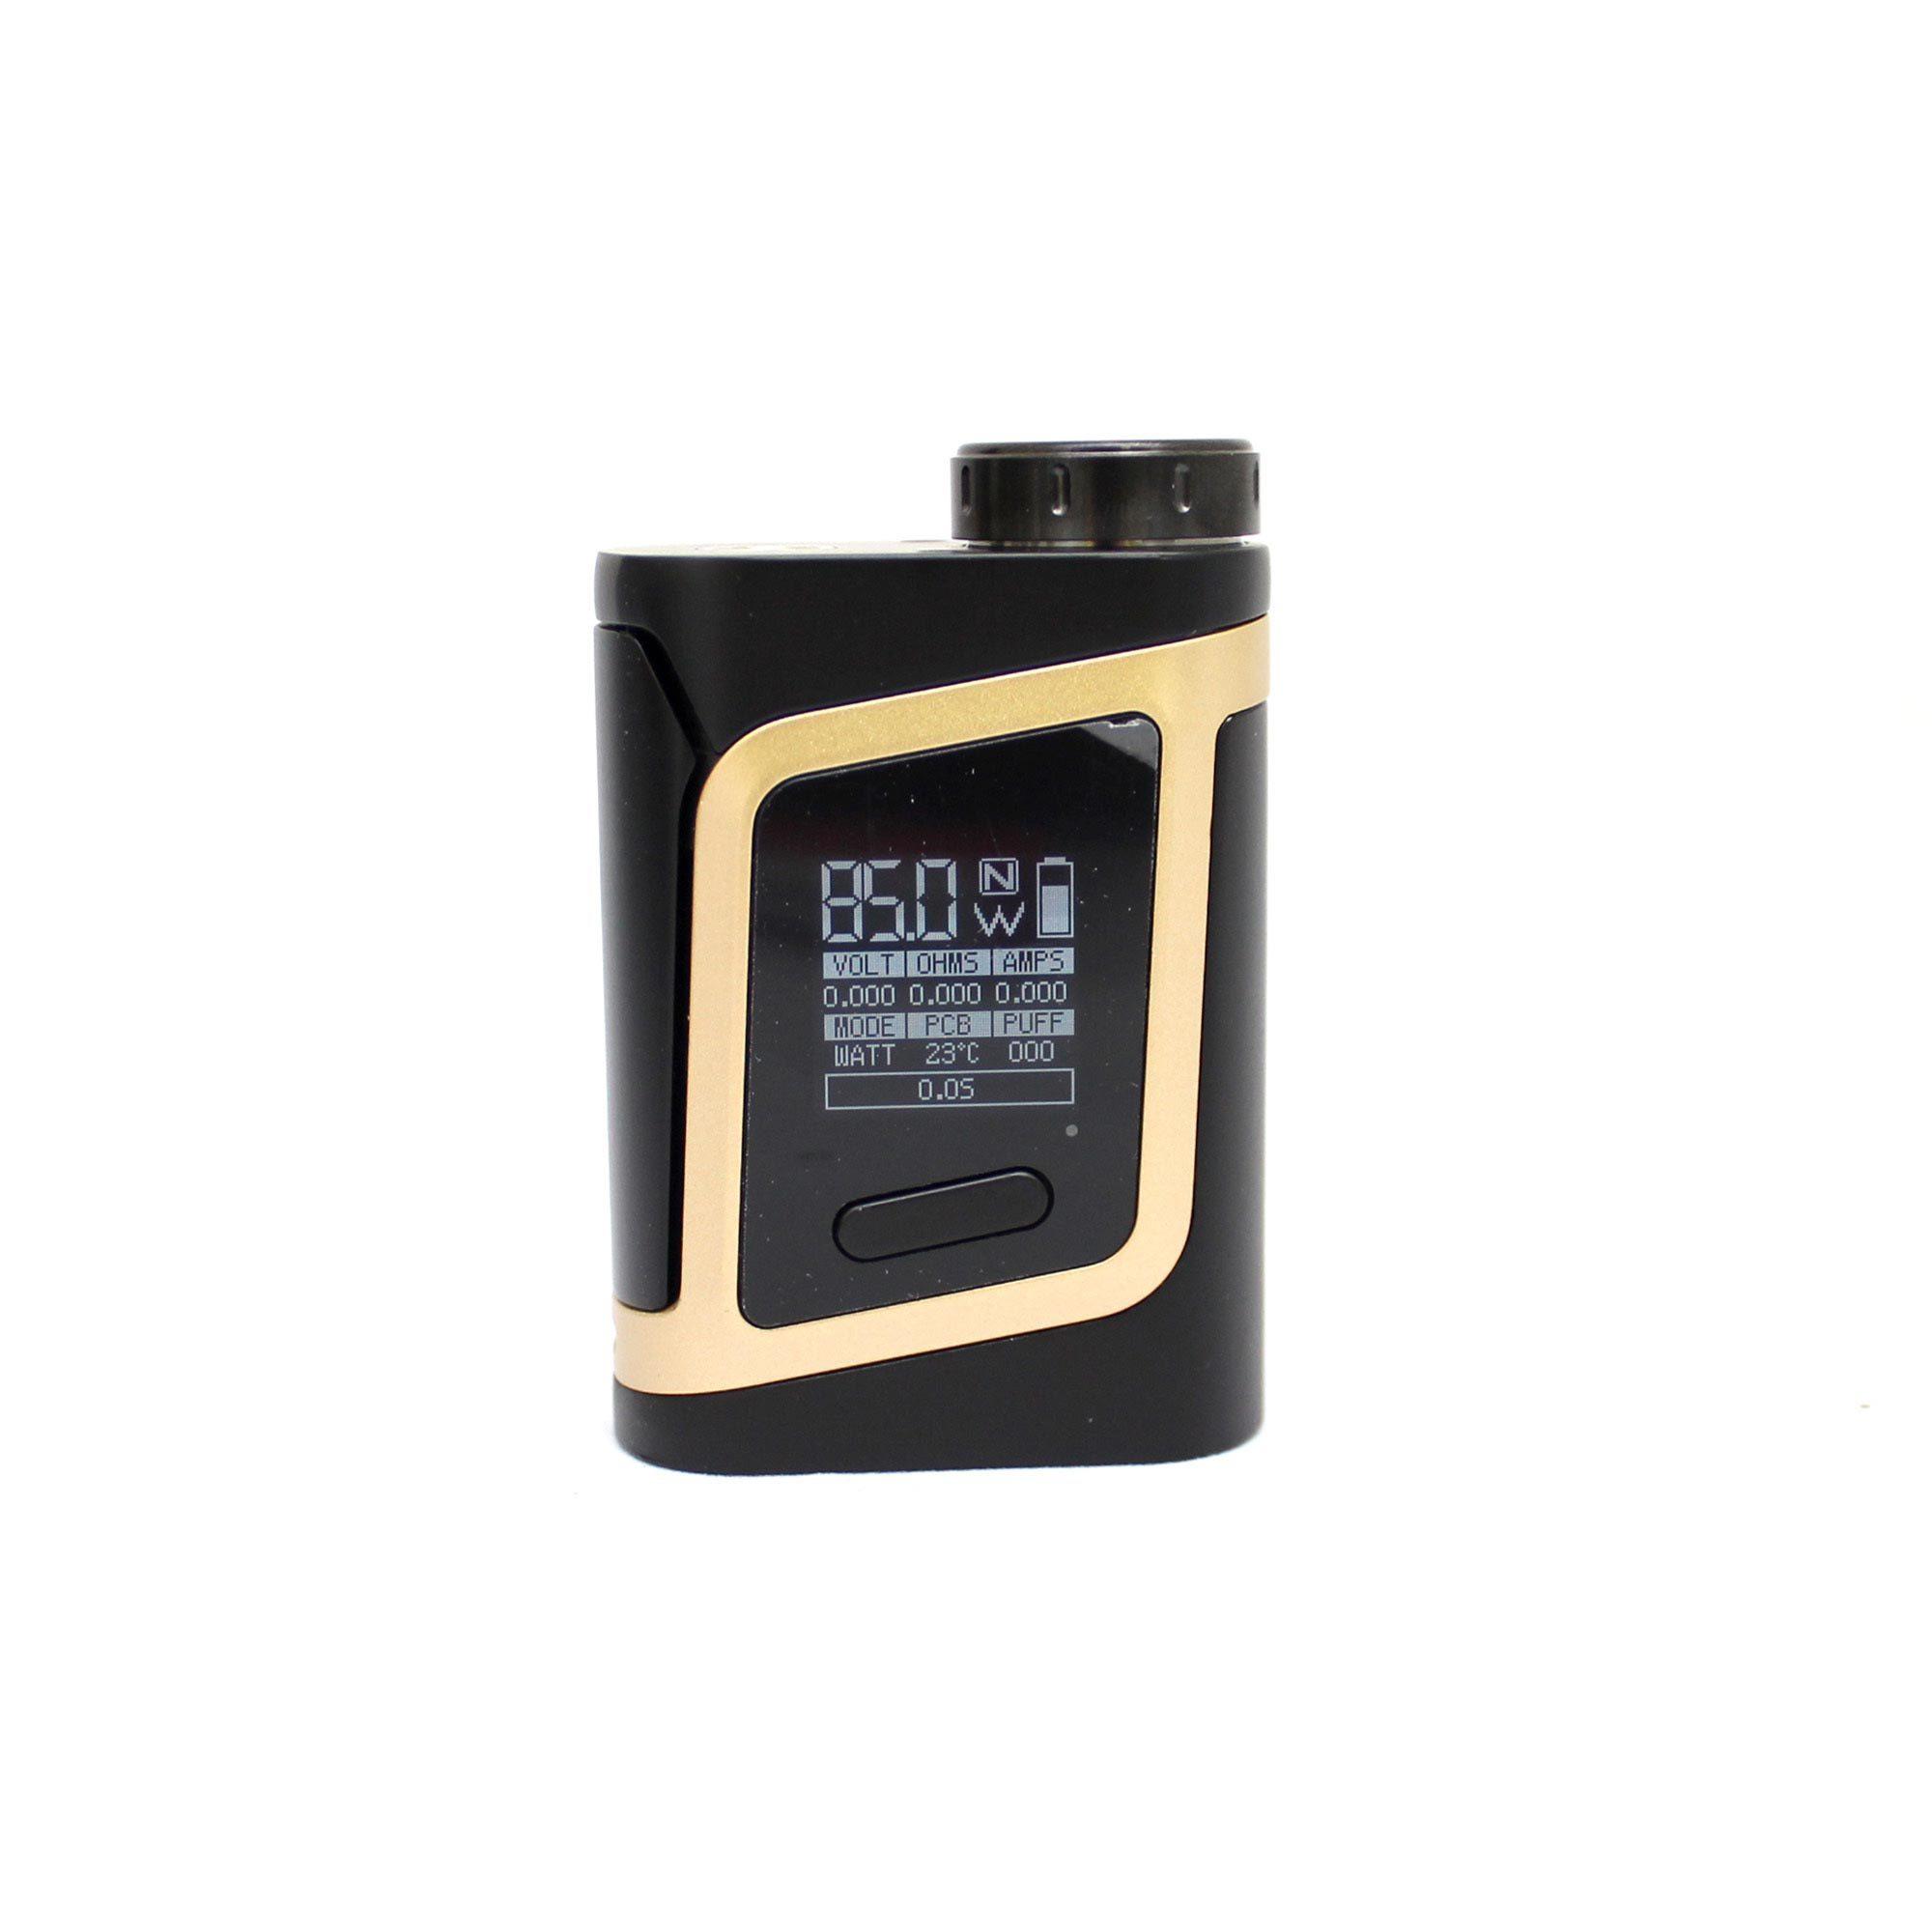 Набор Smok AL 85 Kit боксмод